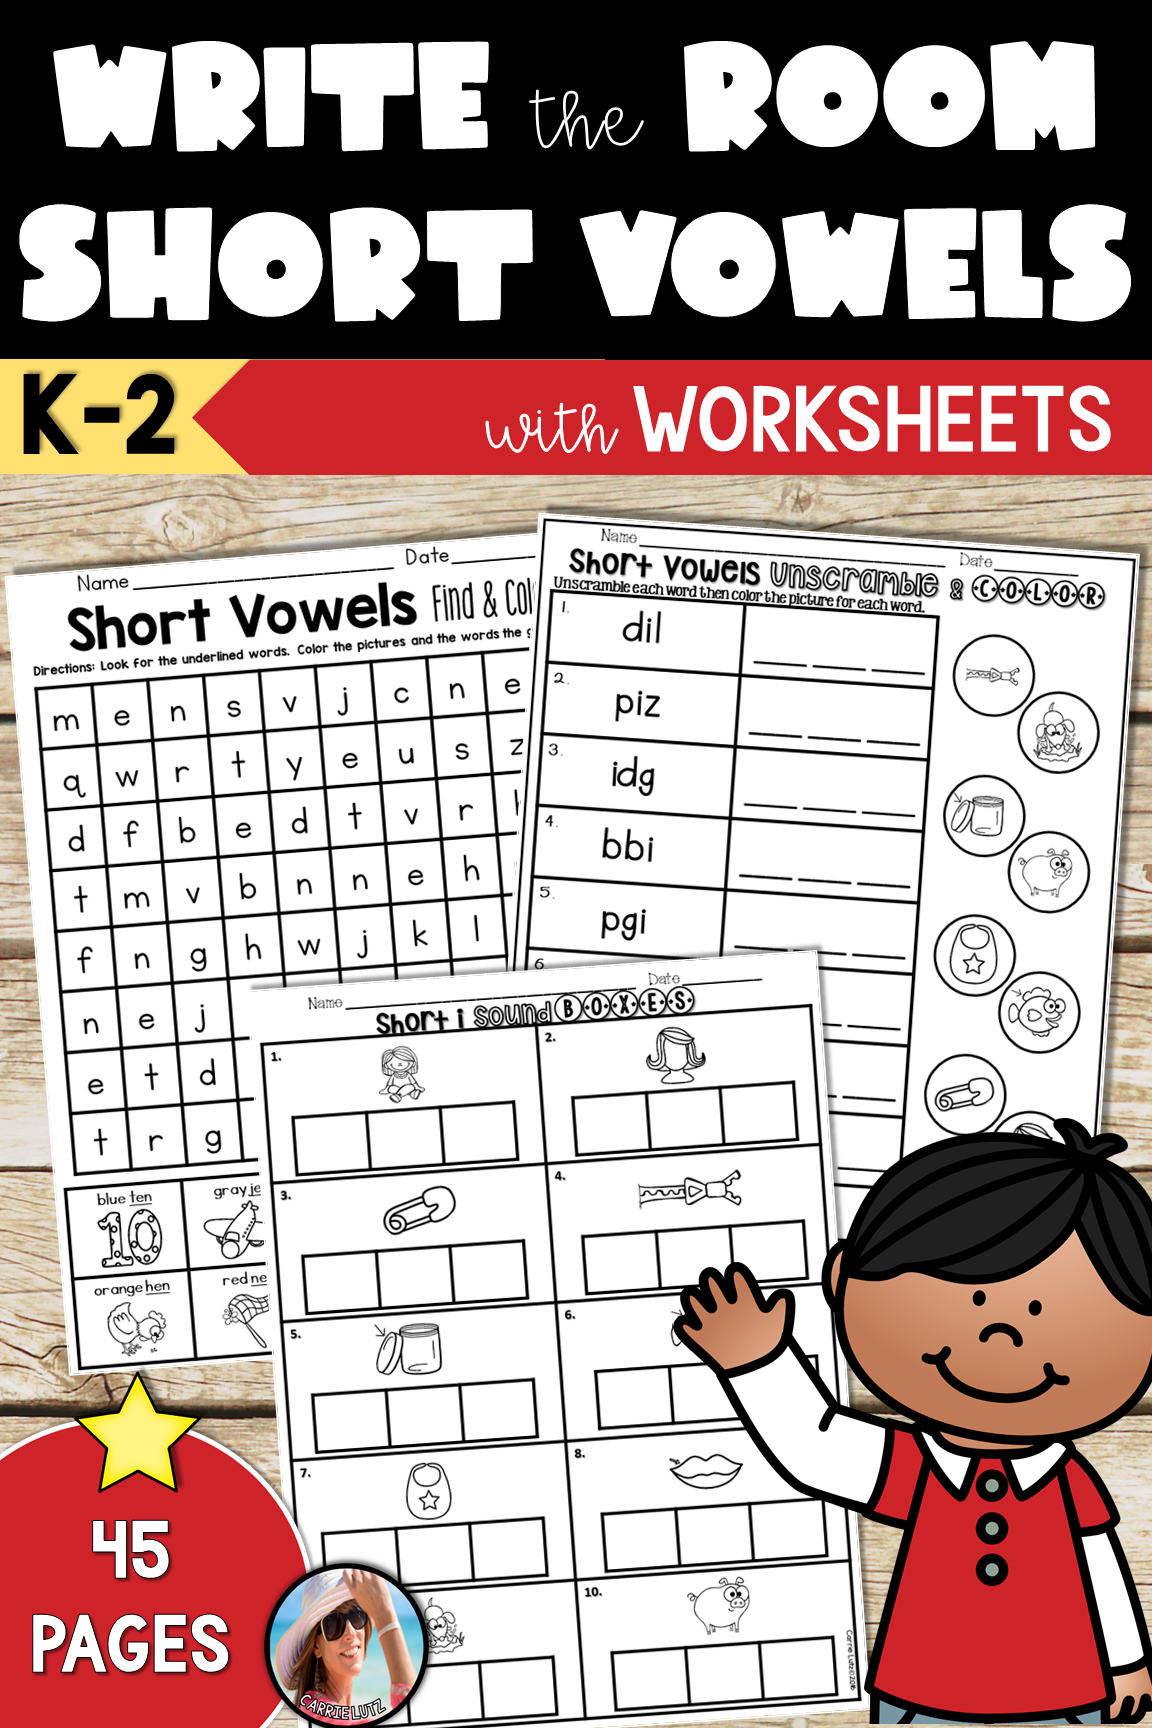 Short Vowels Write The Room Short Vowels Worksheets Short Vowels Vowel Phonics Activities [ 1728 x 1152 Pixel ]